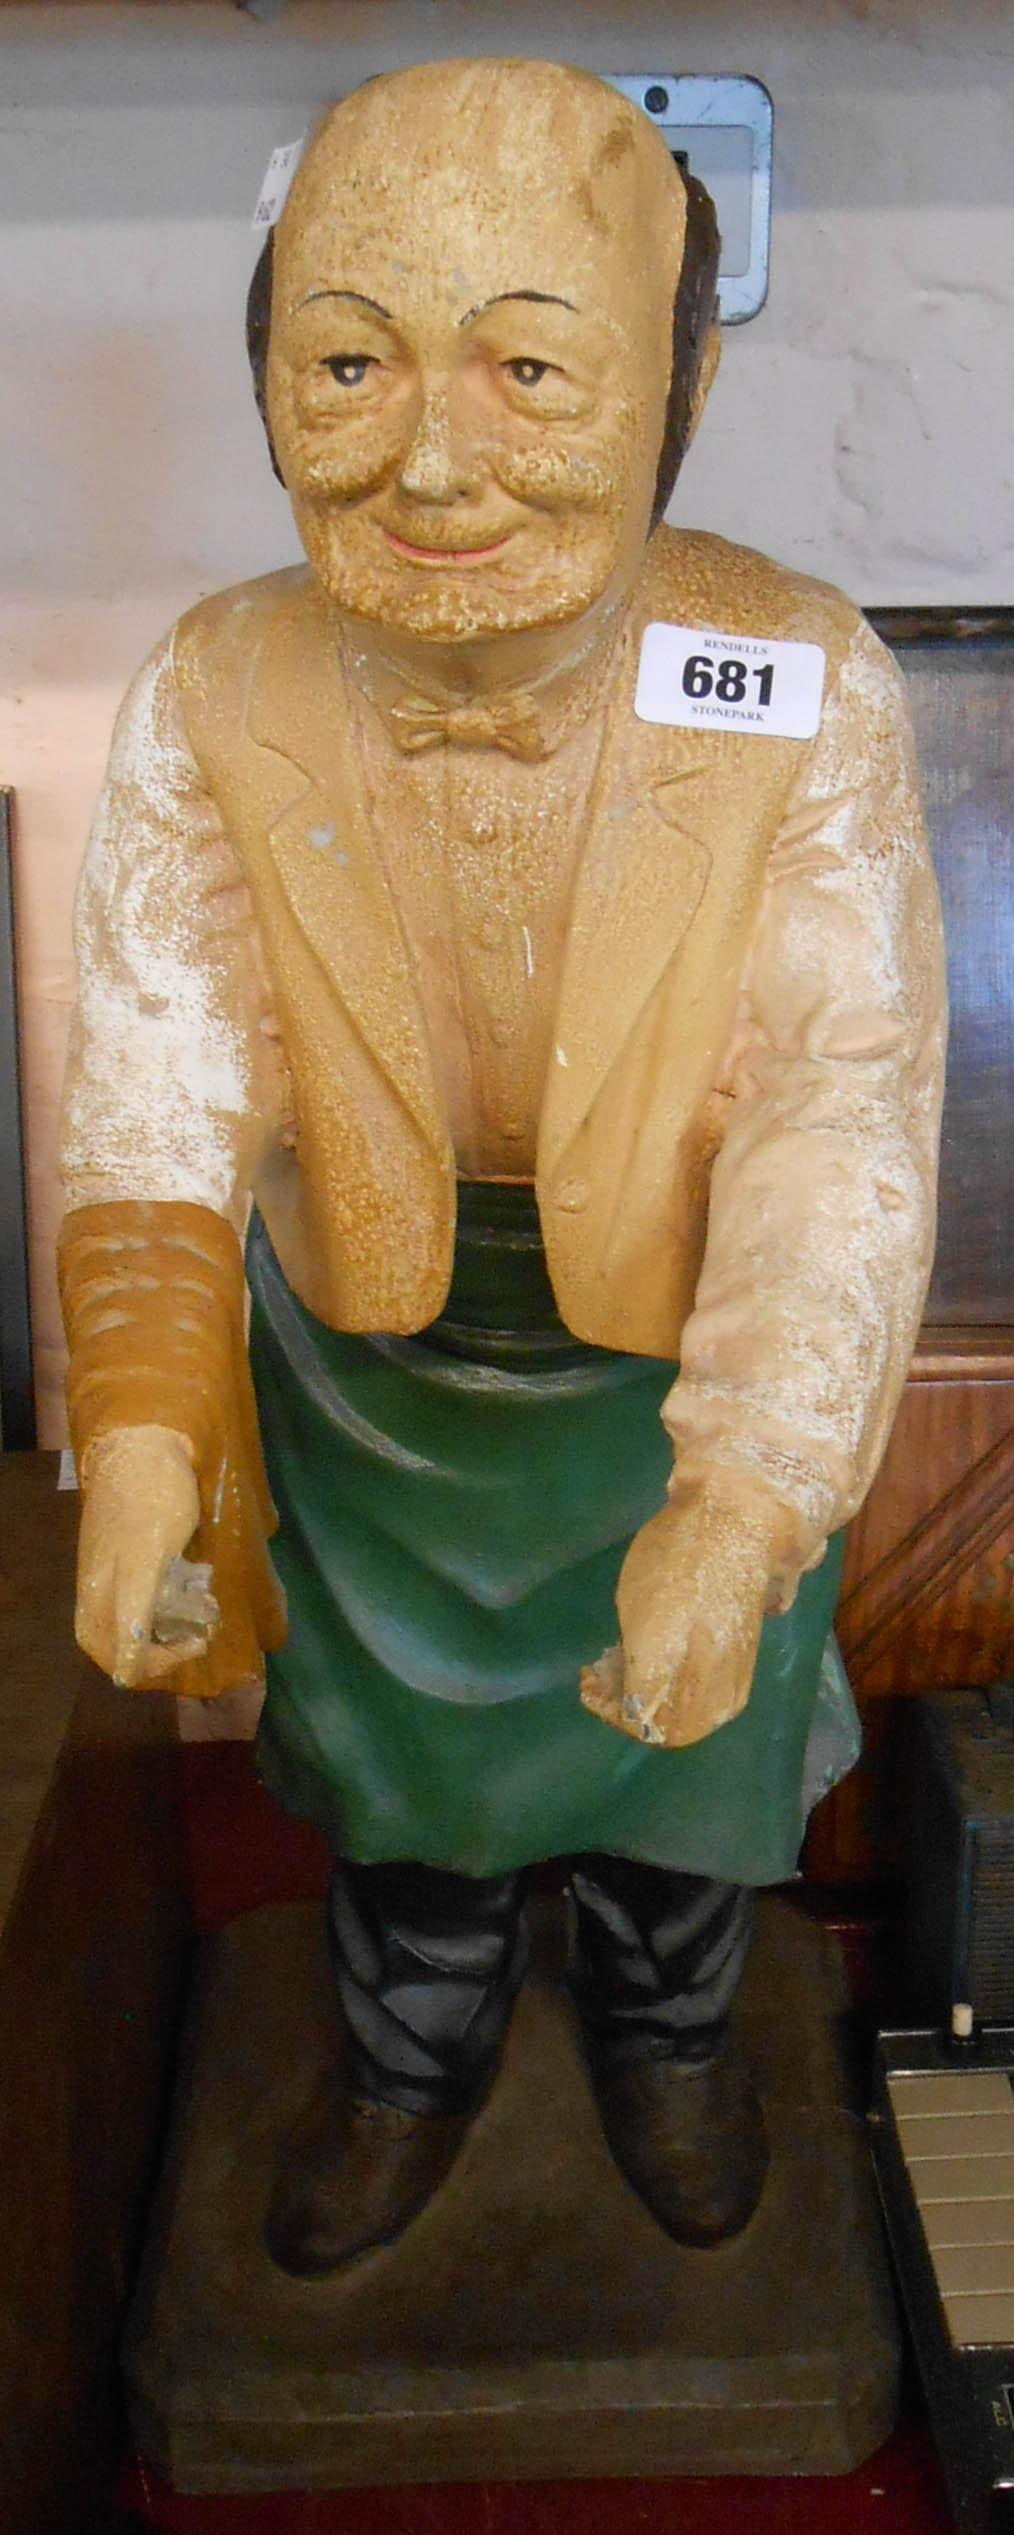 A vintage fibreglass dumb waiter display figure - tray missing